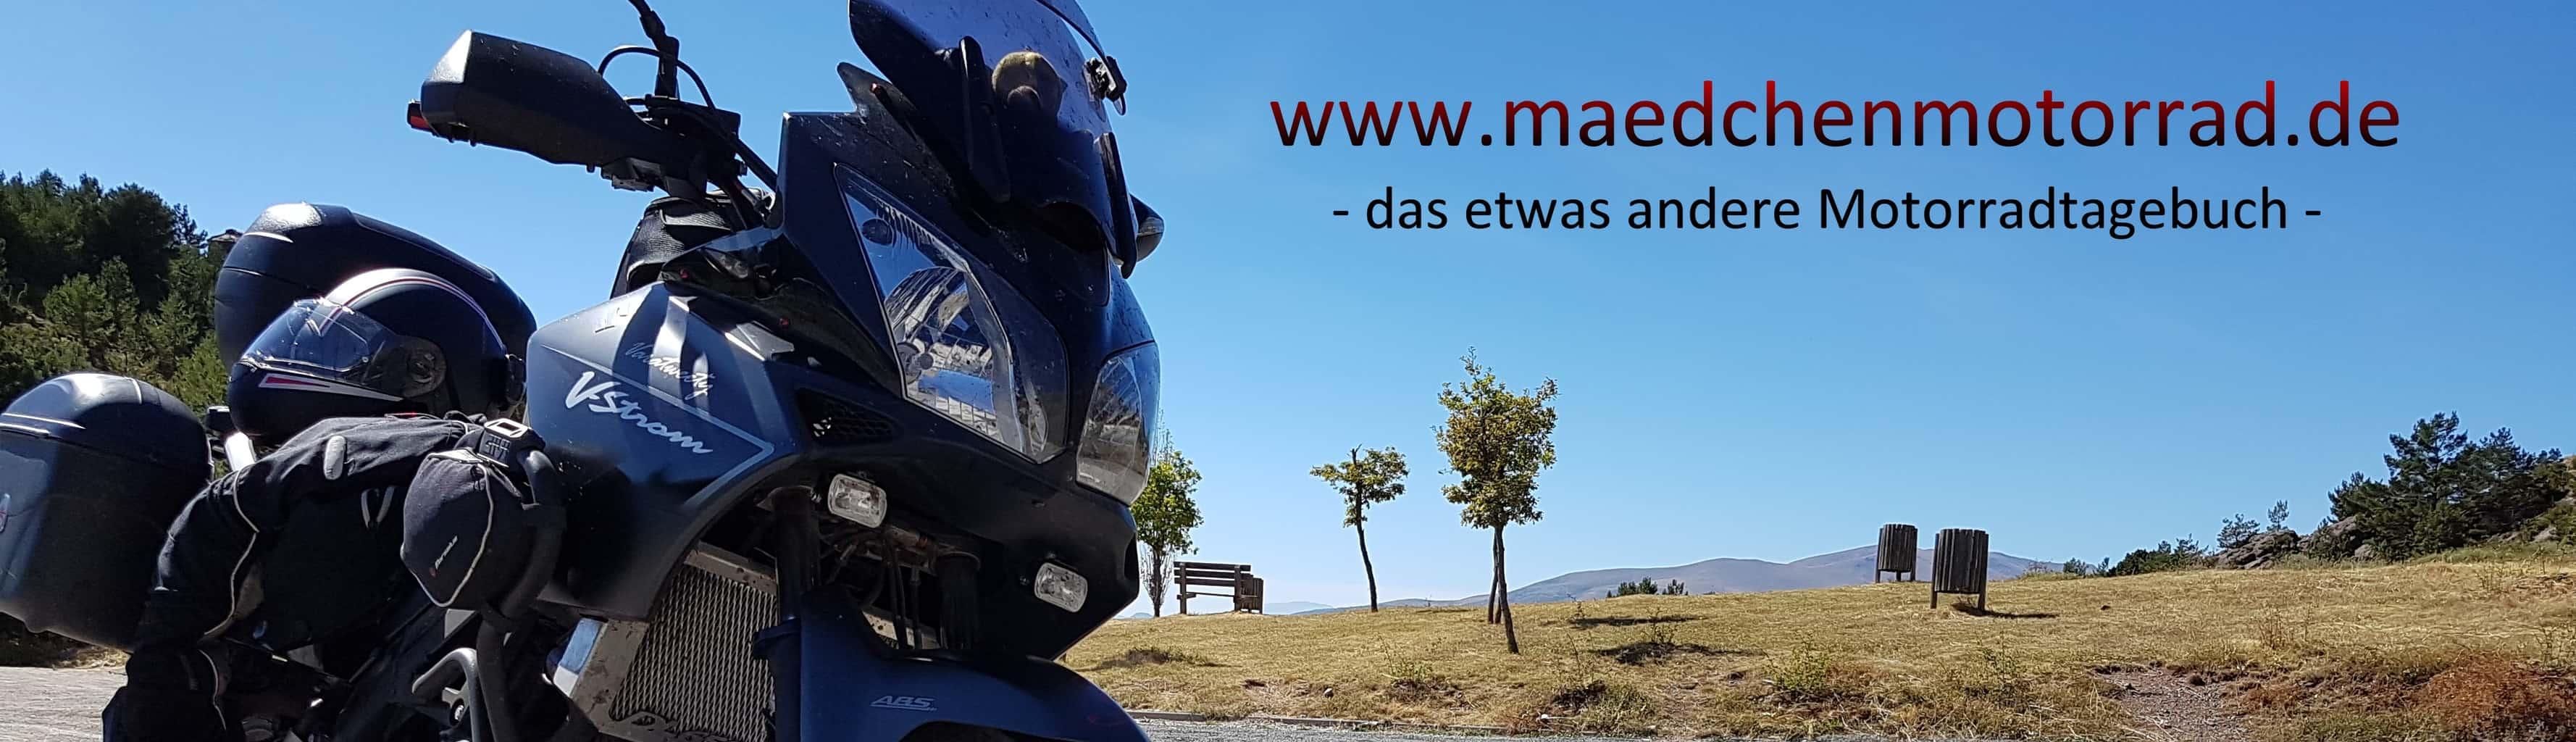 Maedchenmotorrad